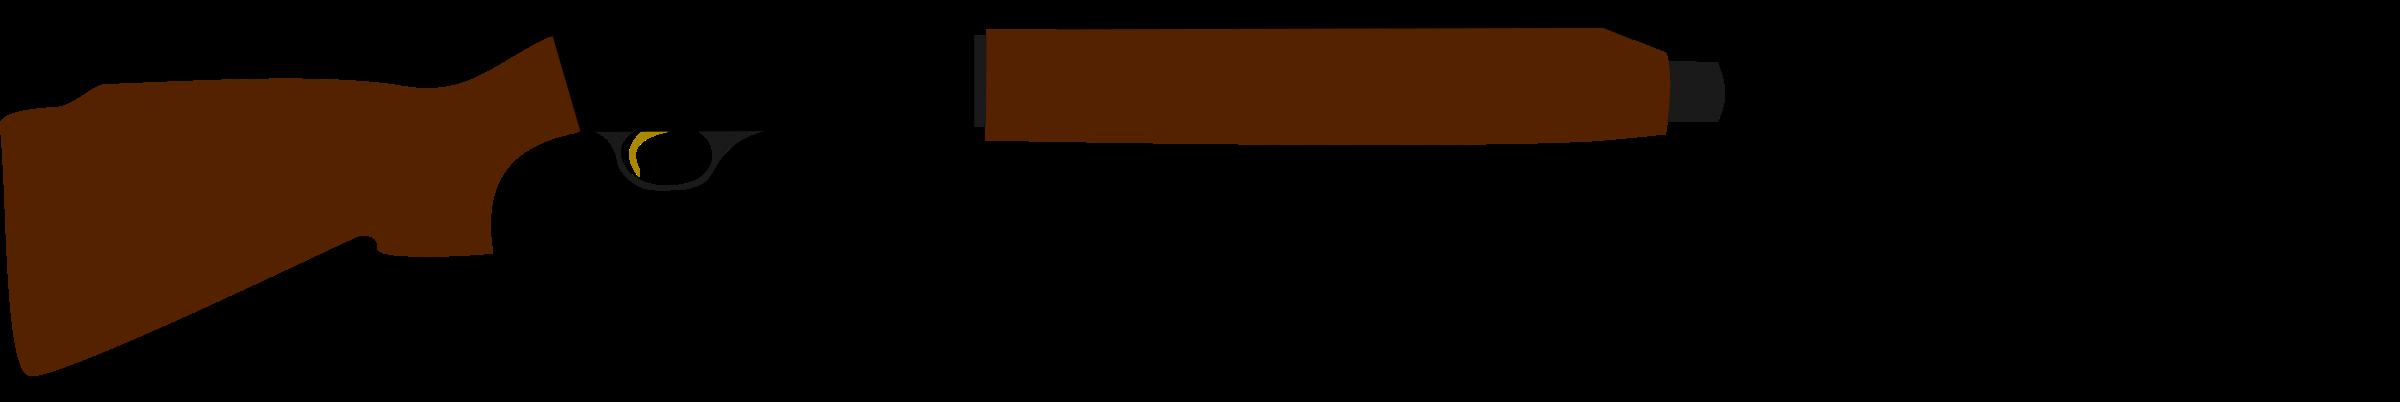 2400x402 Shotgun Clipart Rossi